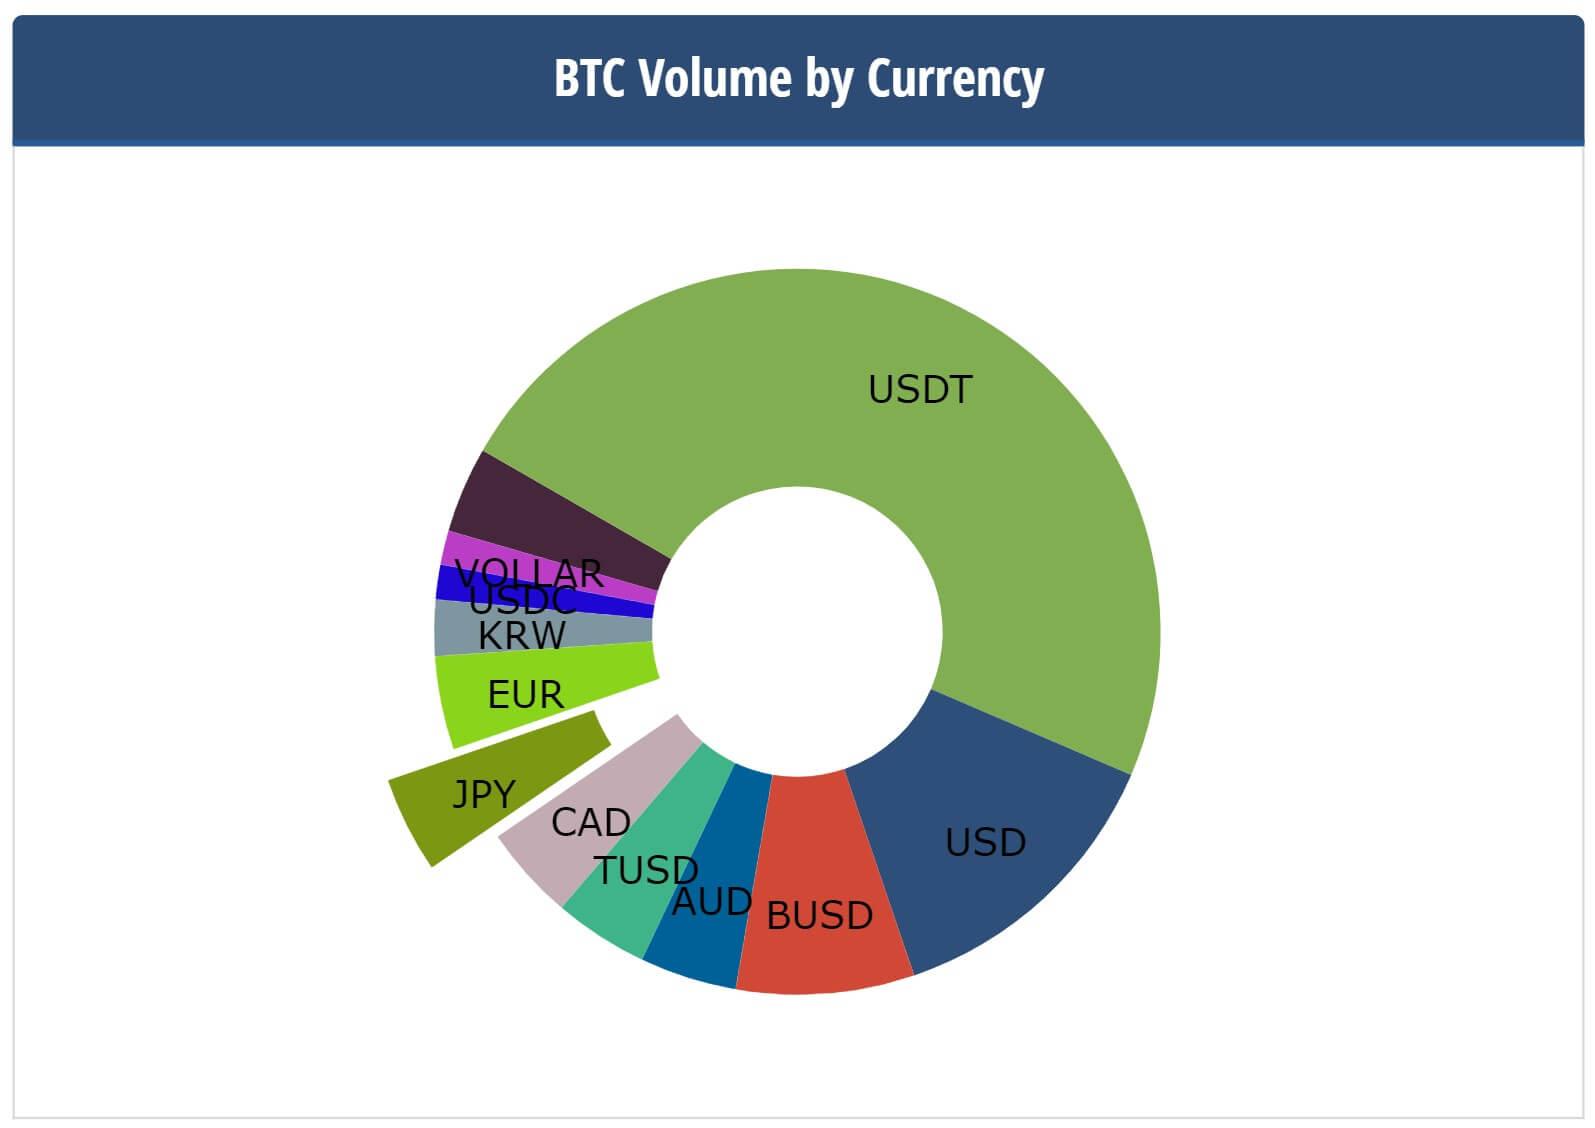 BTC売買における基軸通貨の割合